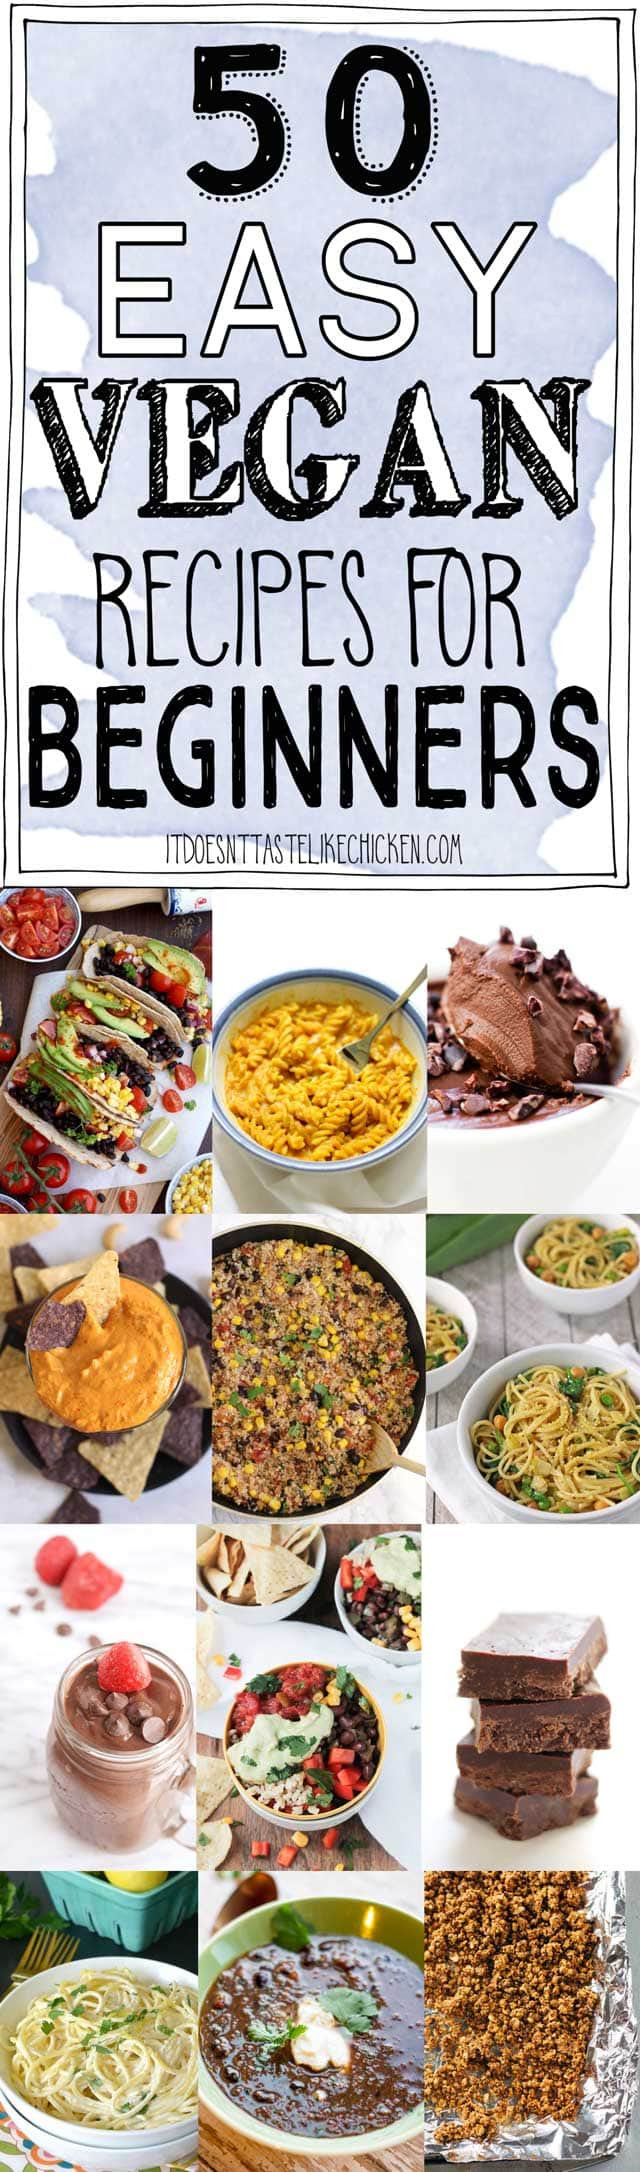 Easy Vegan Recipes For Beginners Simple  50 Easy Vegan Recipes for Beginners • It Doesn t Taste